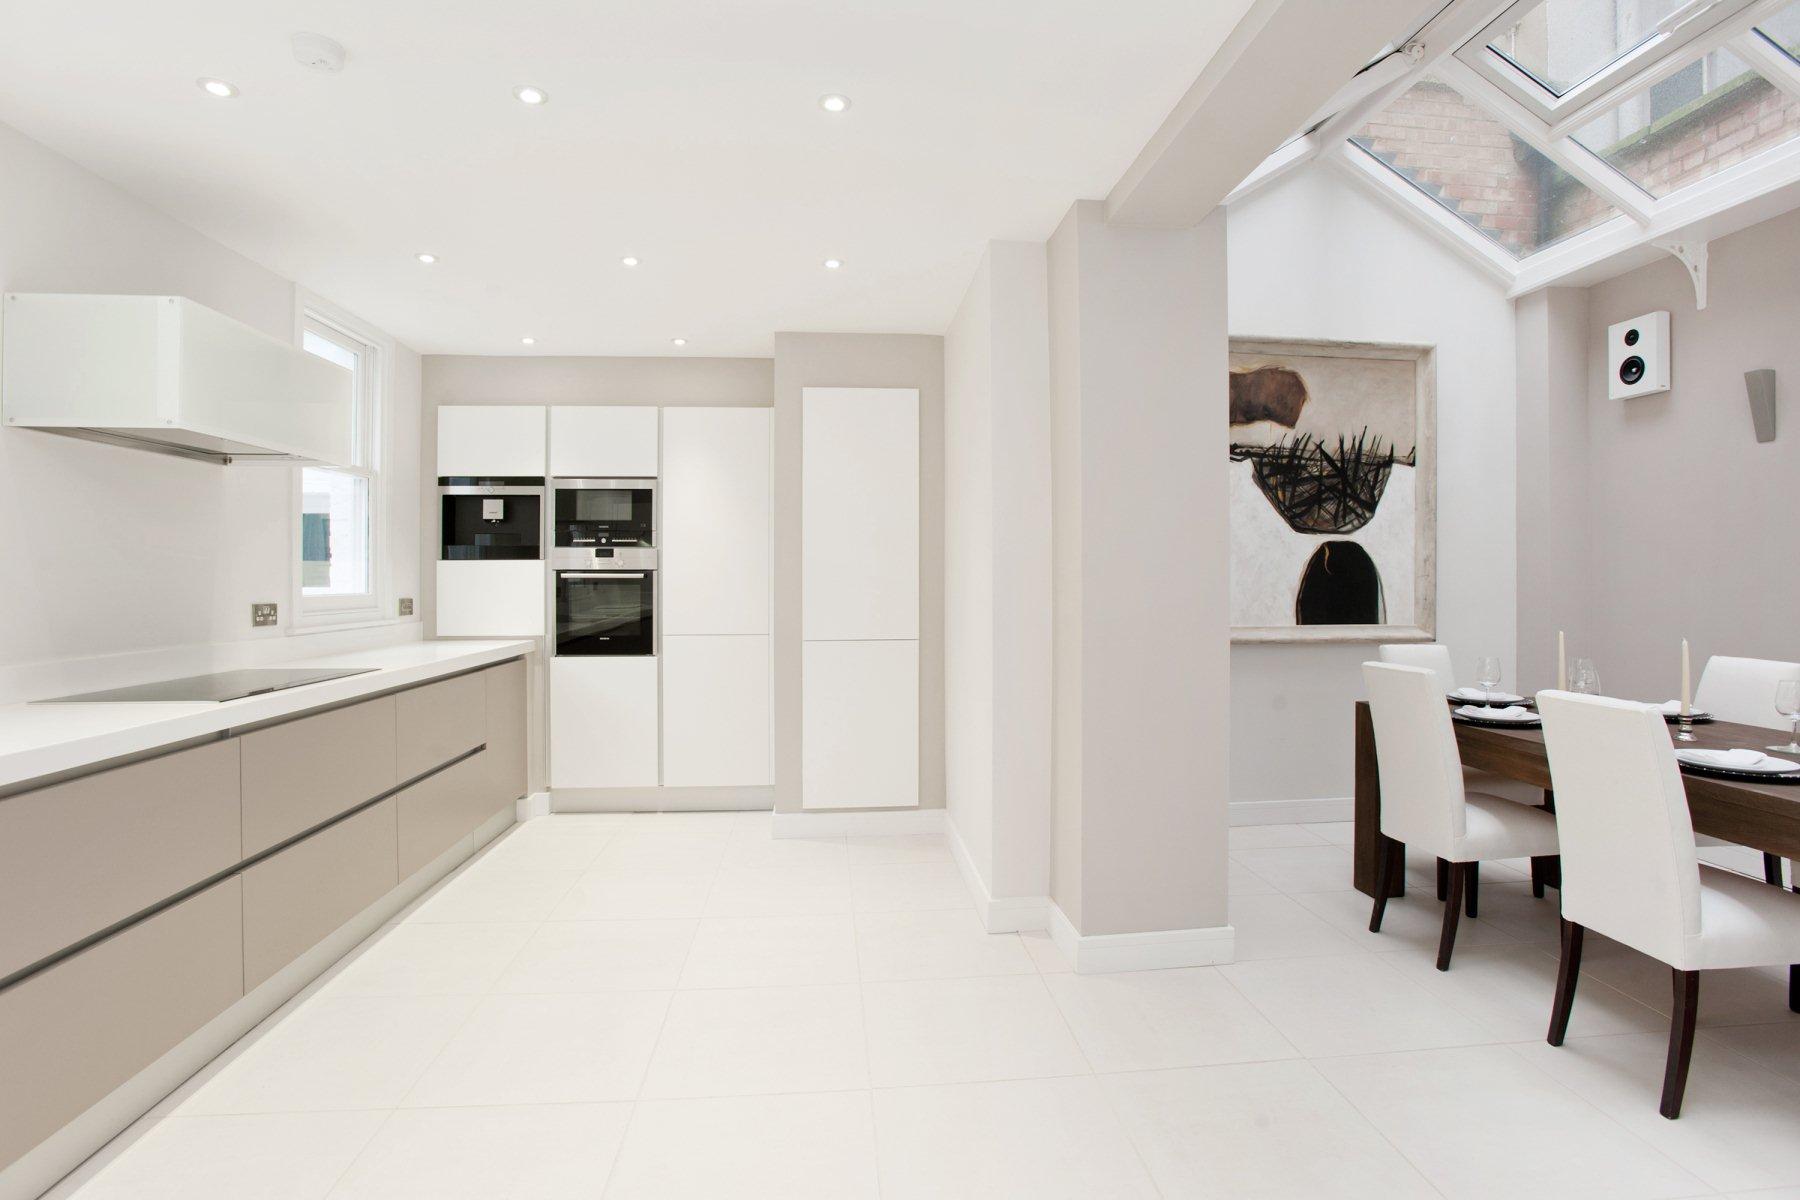 JSPL - 1 Chapter House, SW1P - Kitchen12.jpg